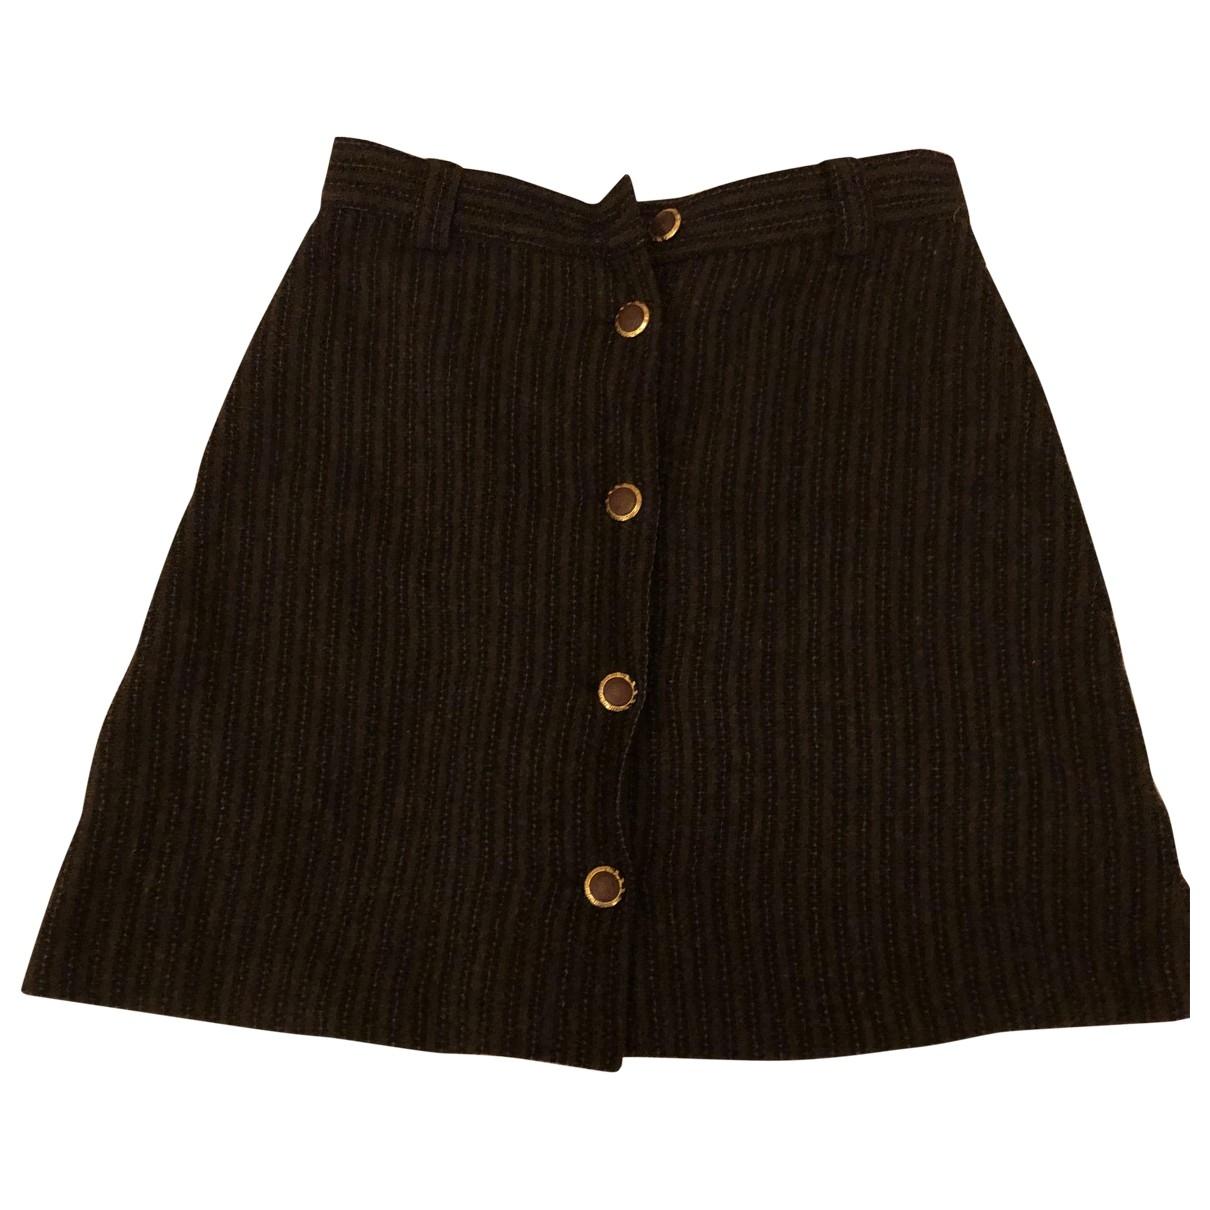 Versace Jeans \N Brown skirt for Women 10 UK